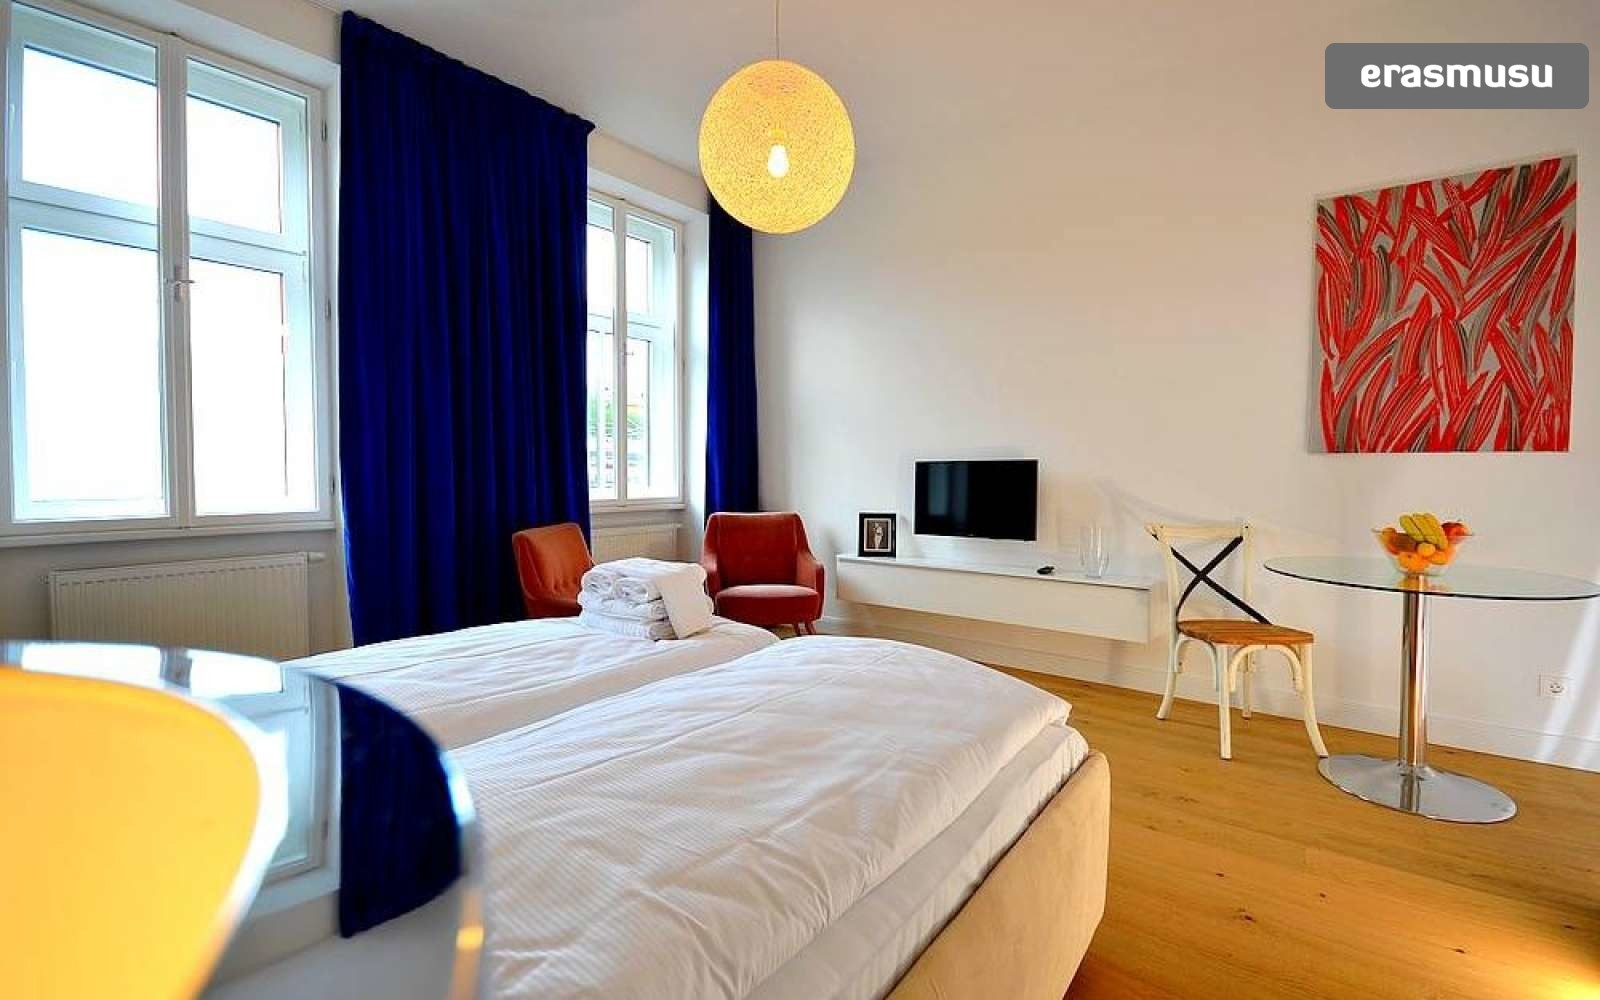 studio-apartment-rent-rudolfsheim-funfhaus-0f90a217655dc3dee8eb2